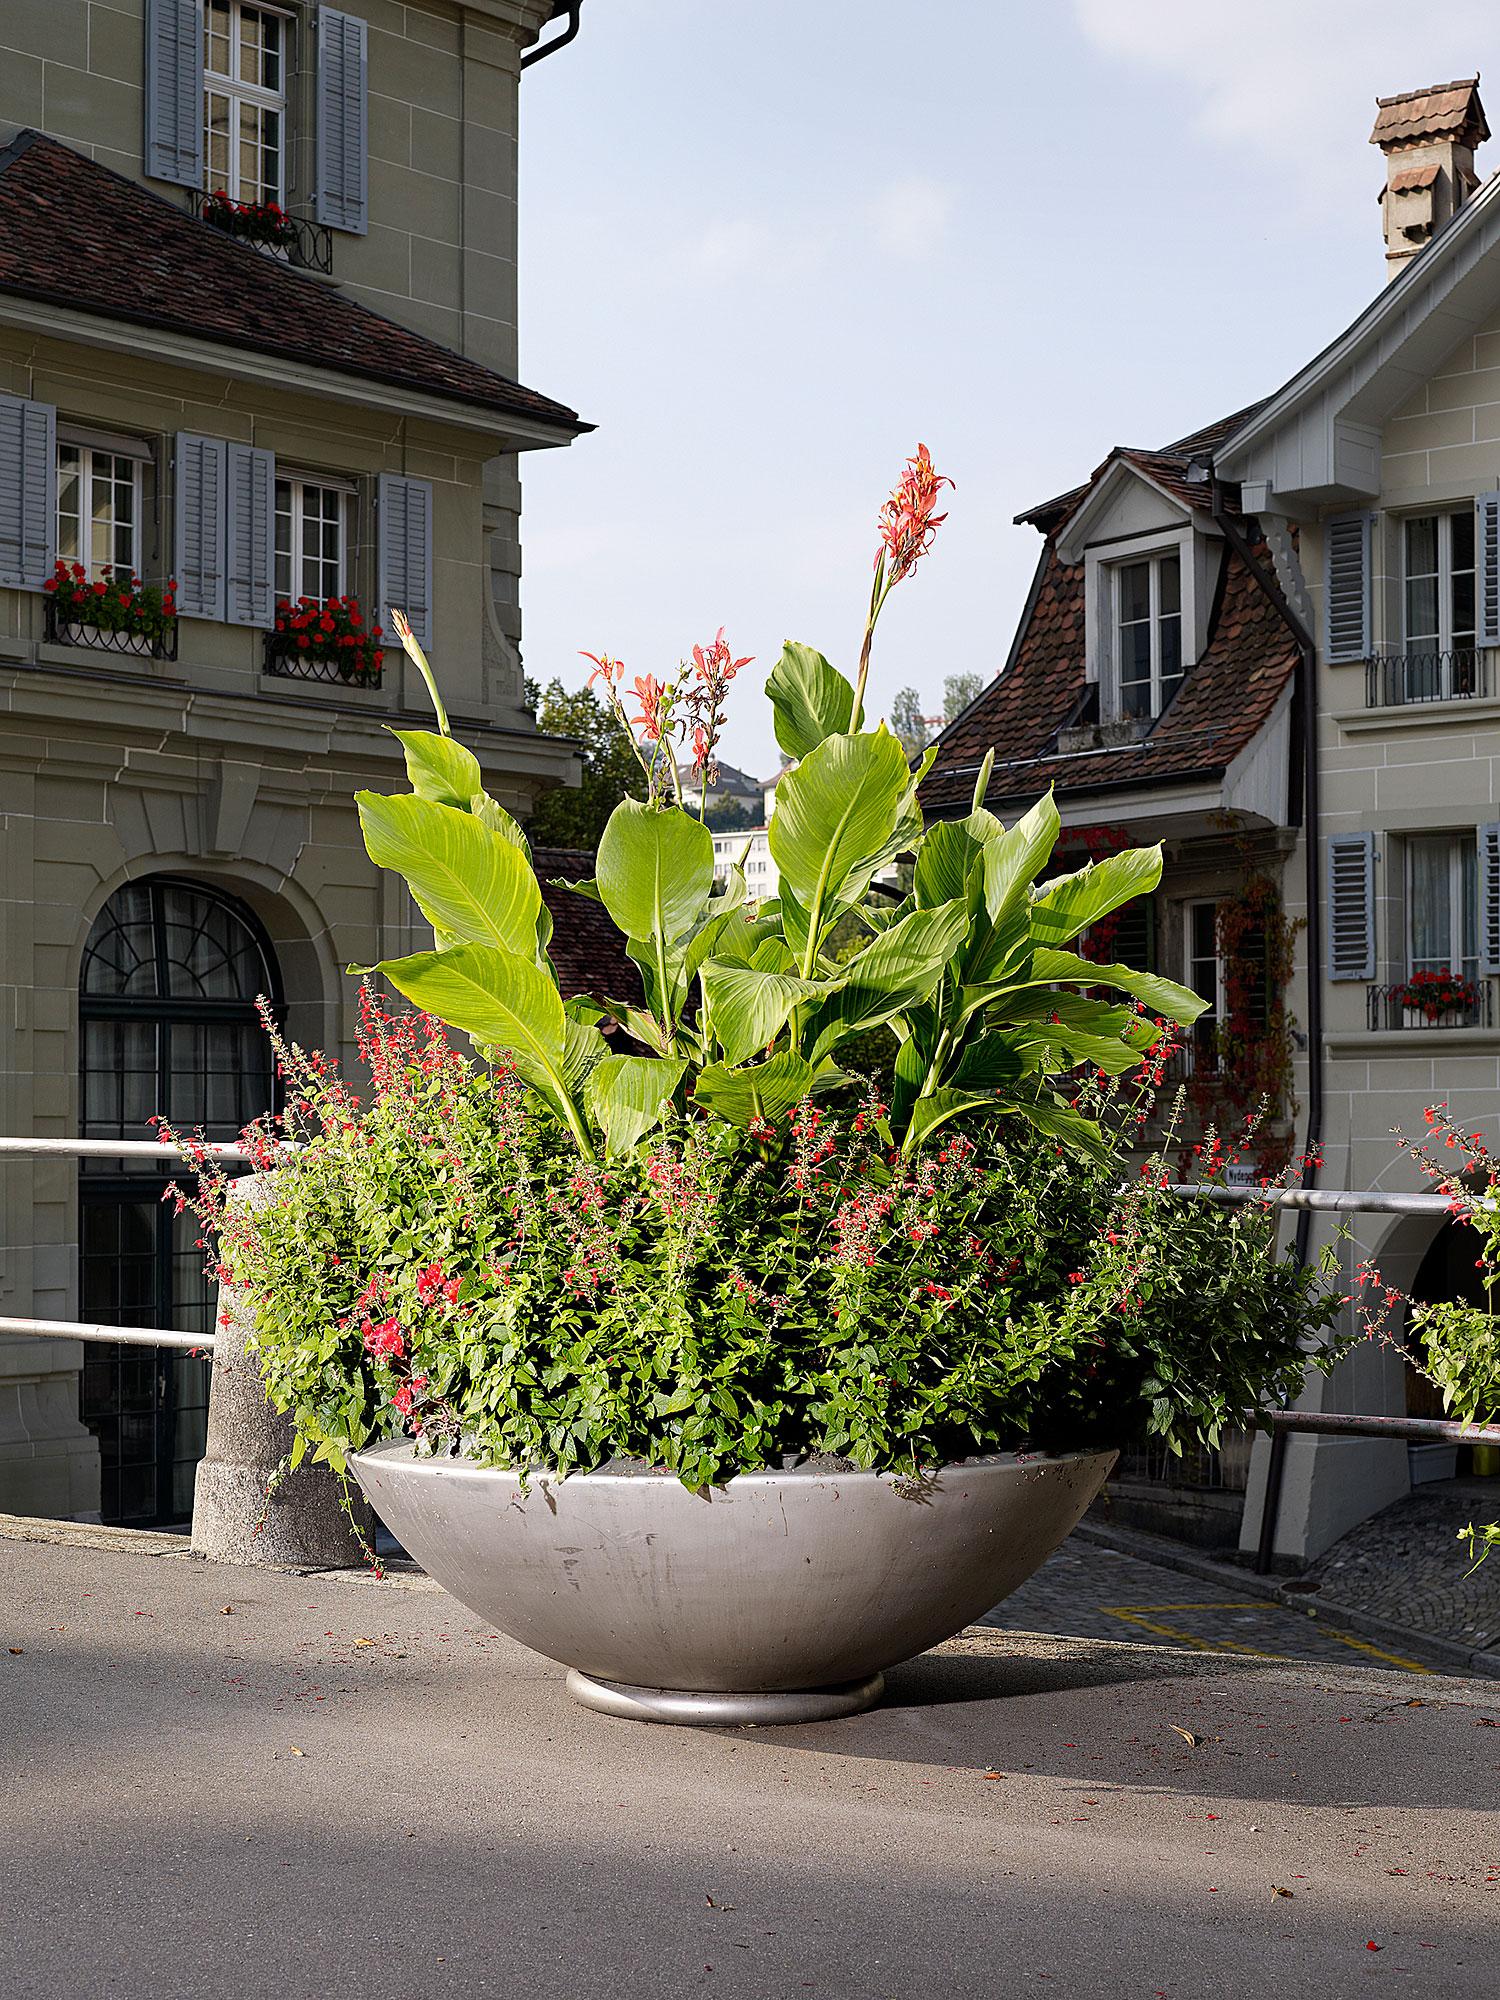 Berner Schale, Bern, 2004